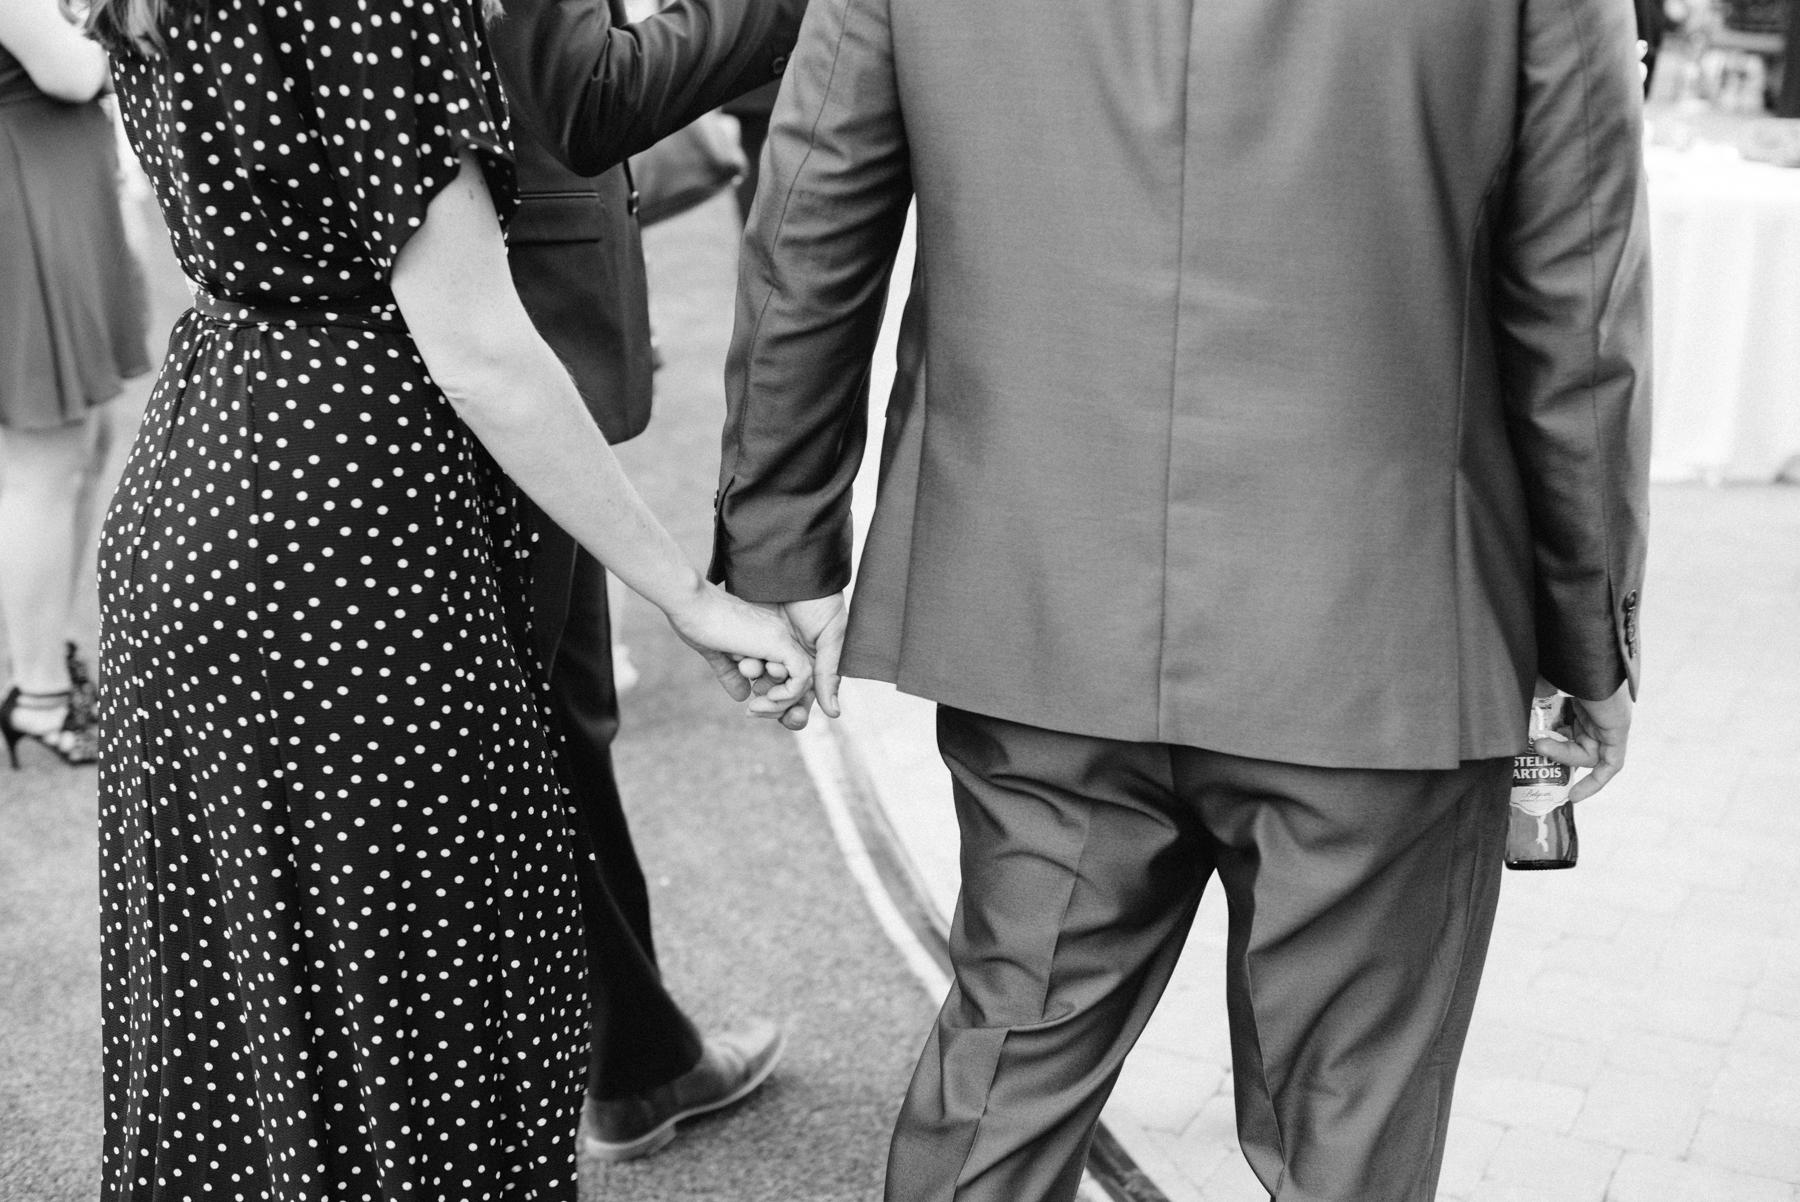 Secret Garden Event Center Wedding - Meredith Amadee Photography-4-4.jpg